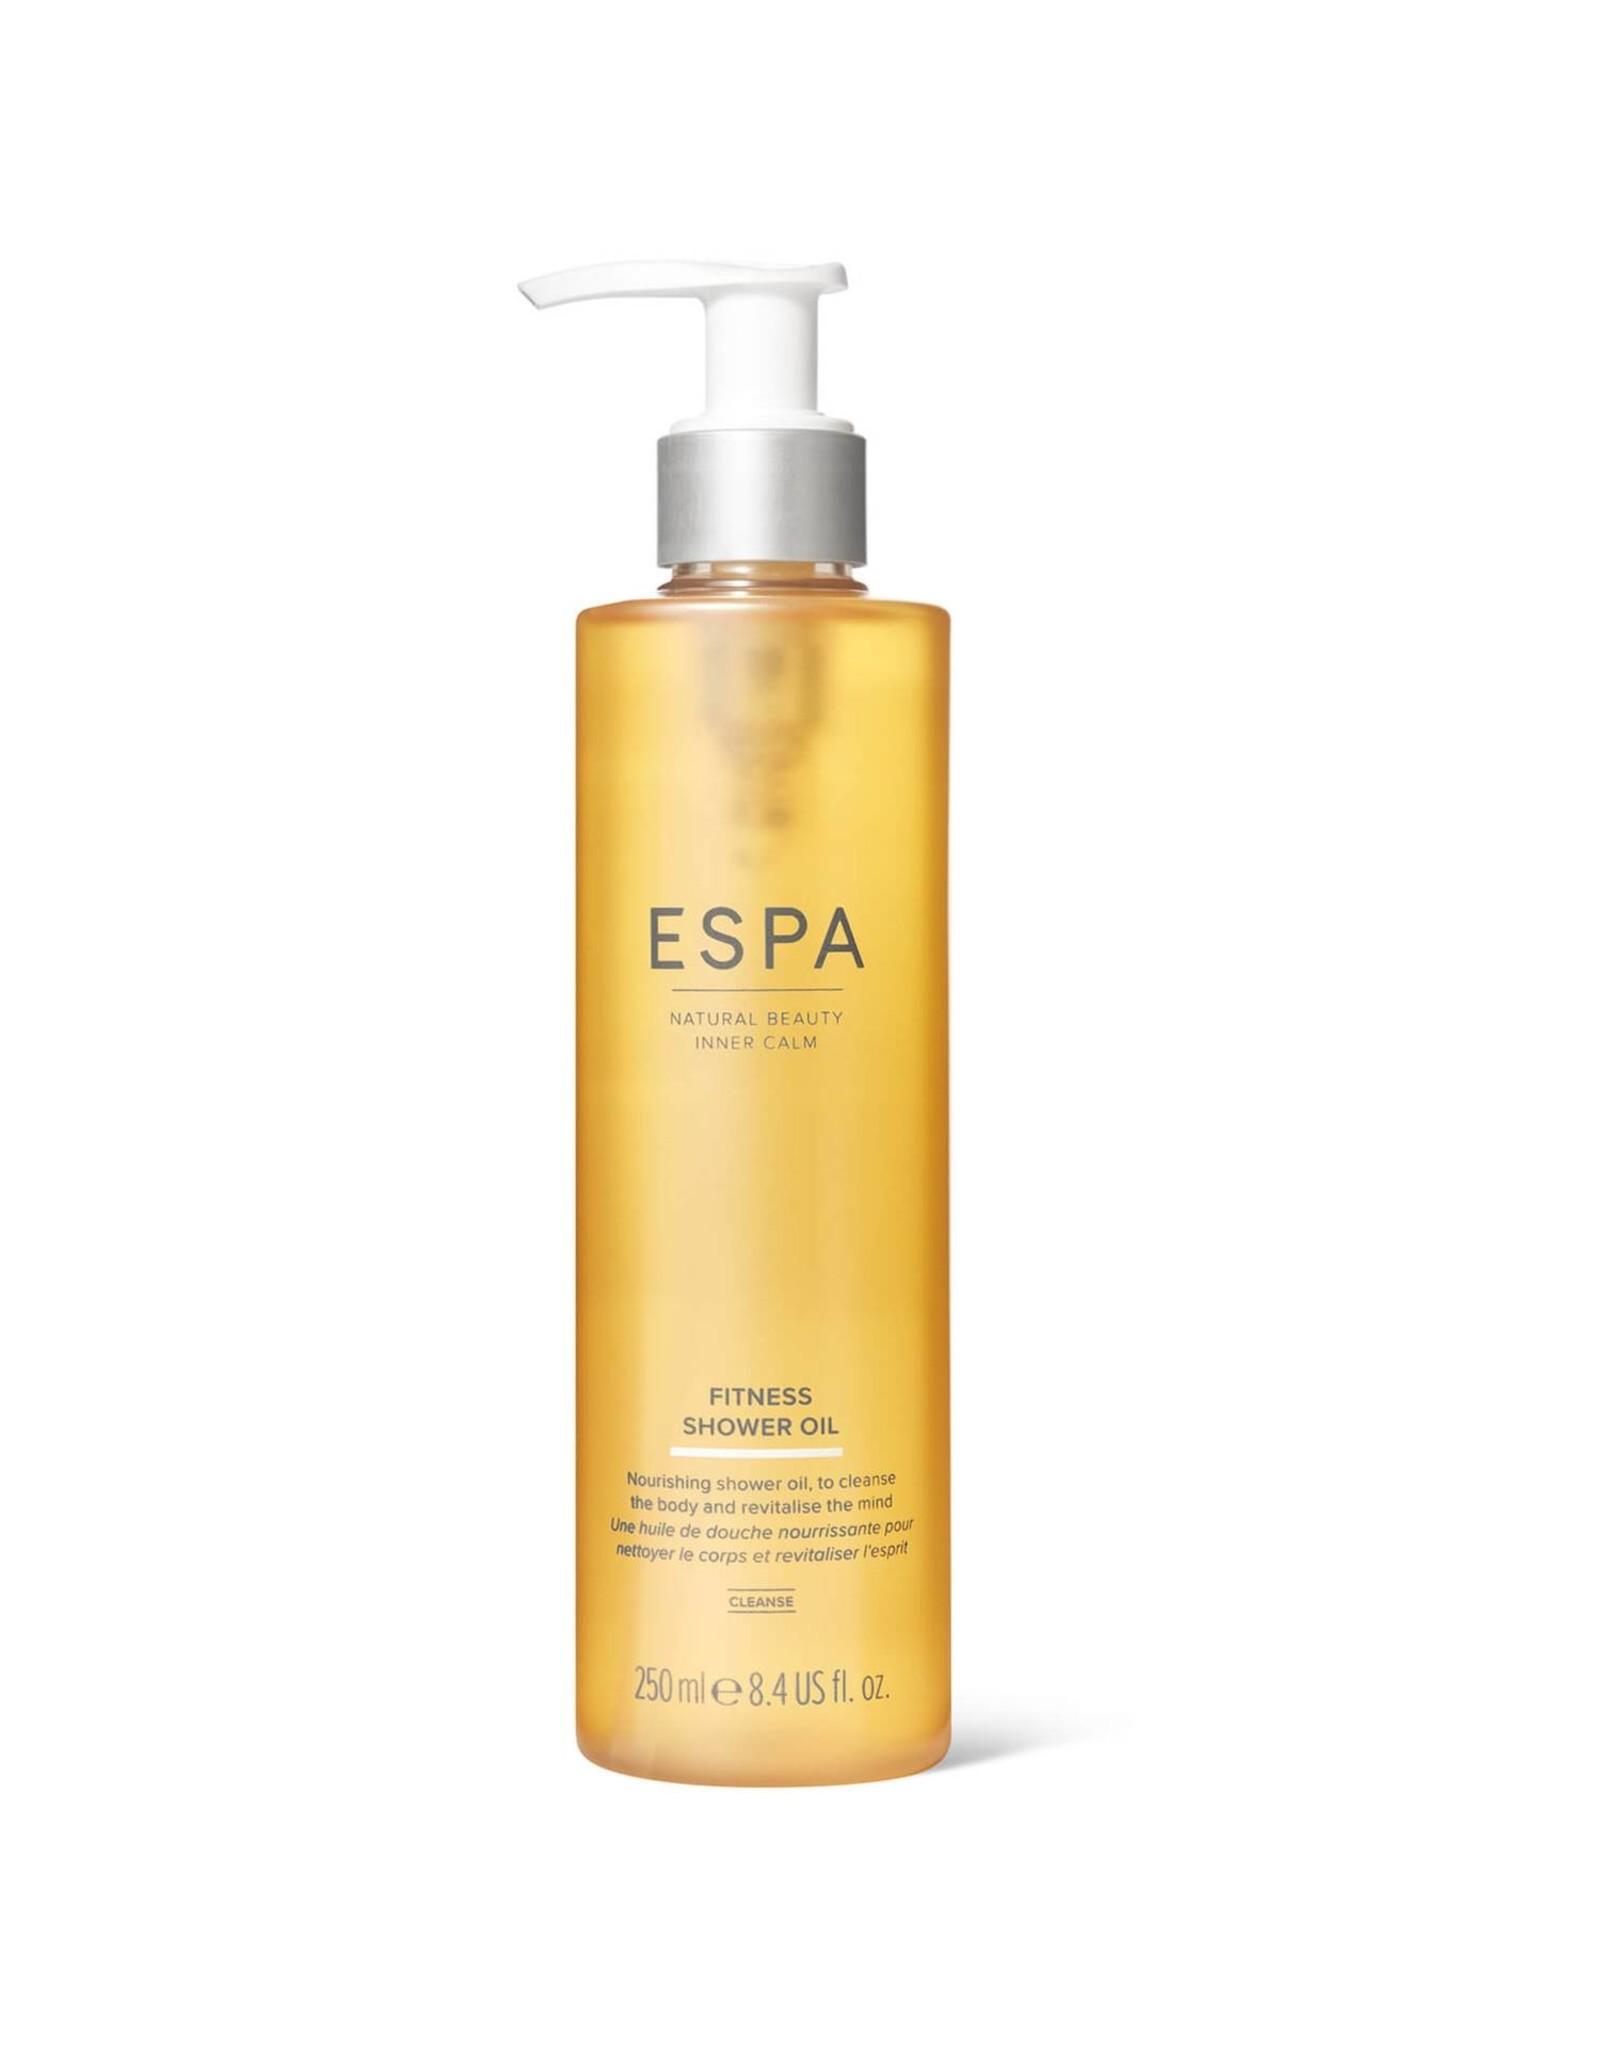 ESPA Fitness Shower Oil, 250ml